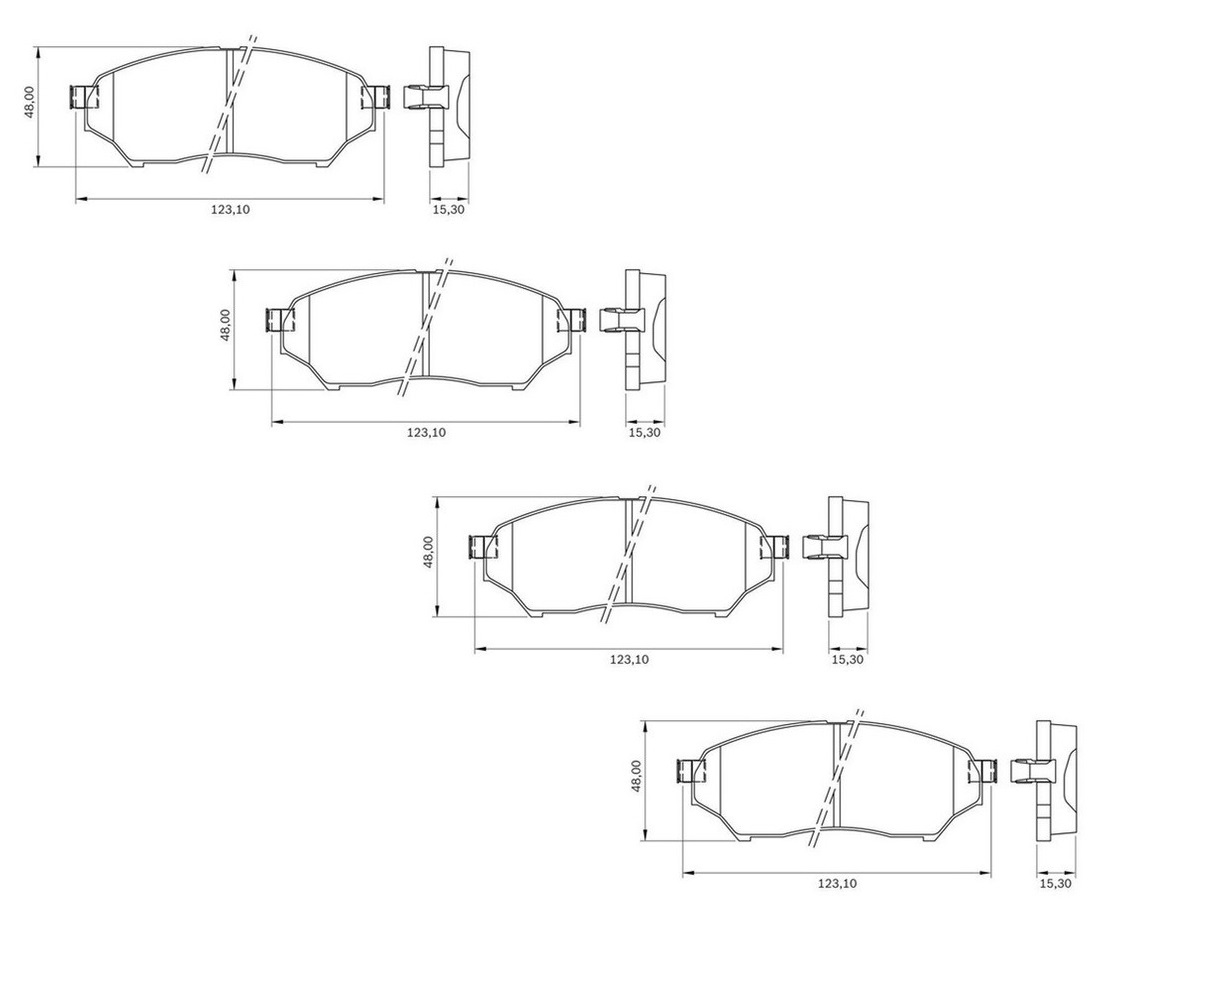 Pastilha Dianteiro Mitsubishi Tr4 2.0 2007 a 2015 fras-le